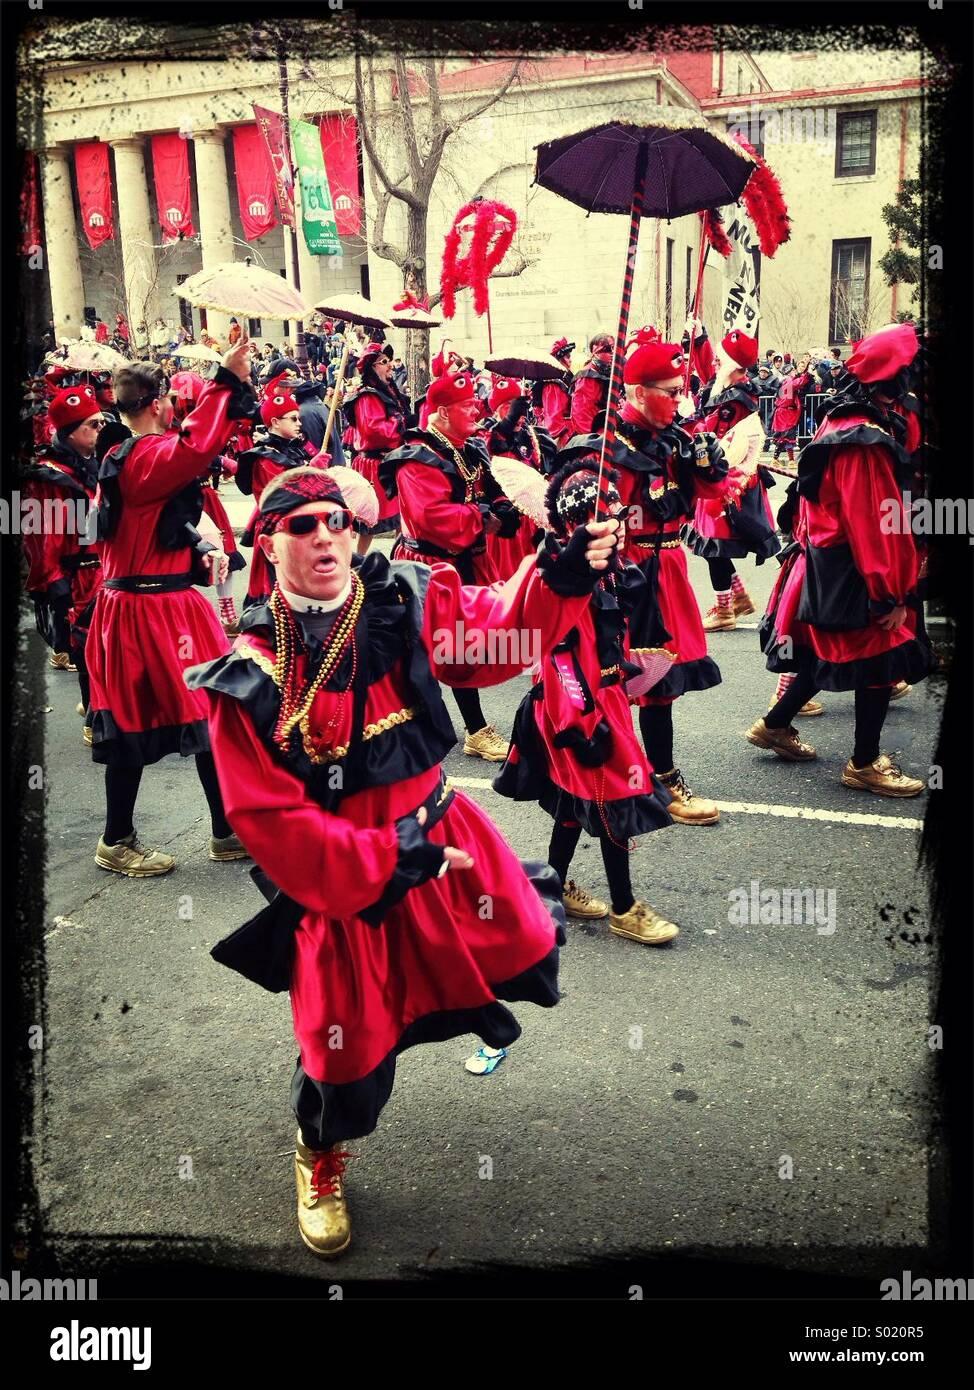 Philadelphia Mummers Parade 2014 - Stock Image